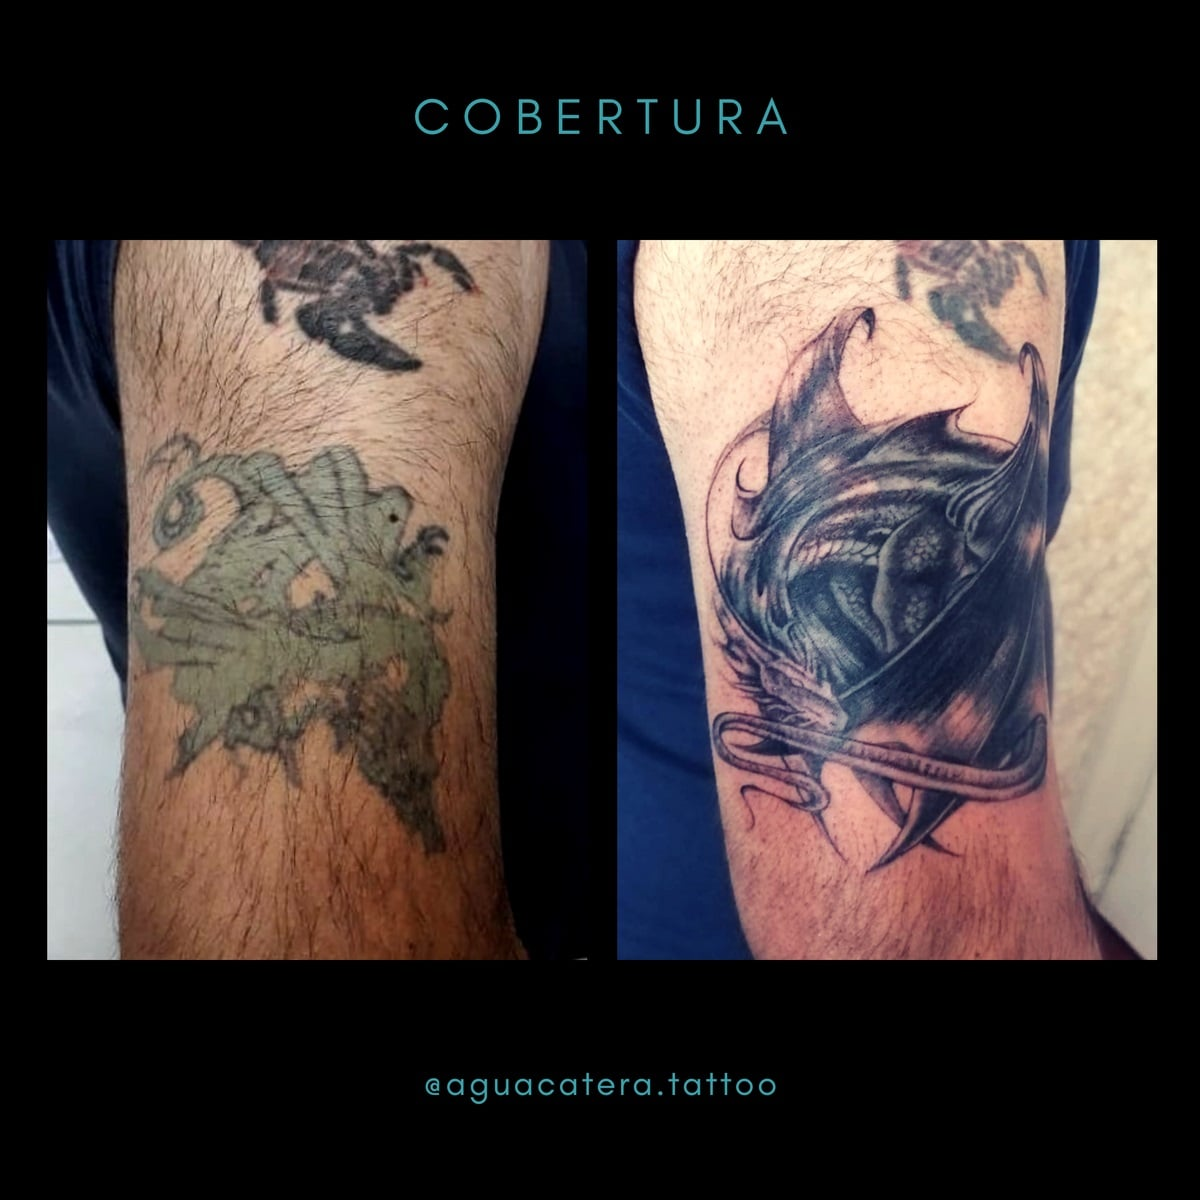 juliana-fuenzalida-tattoo-artist-cover-up-arm-black